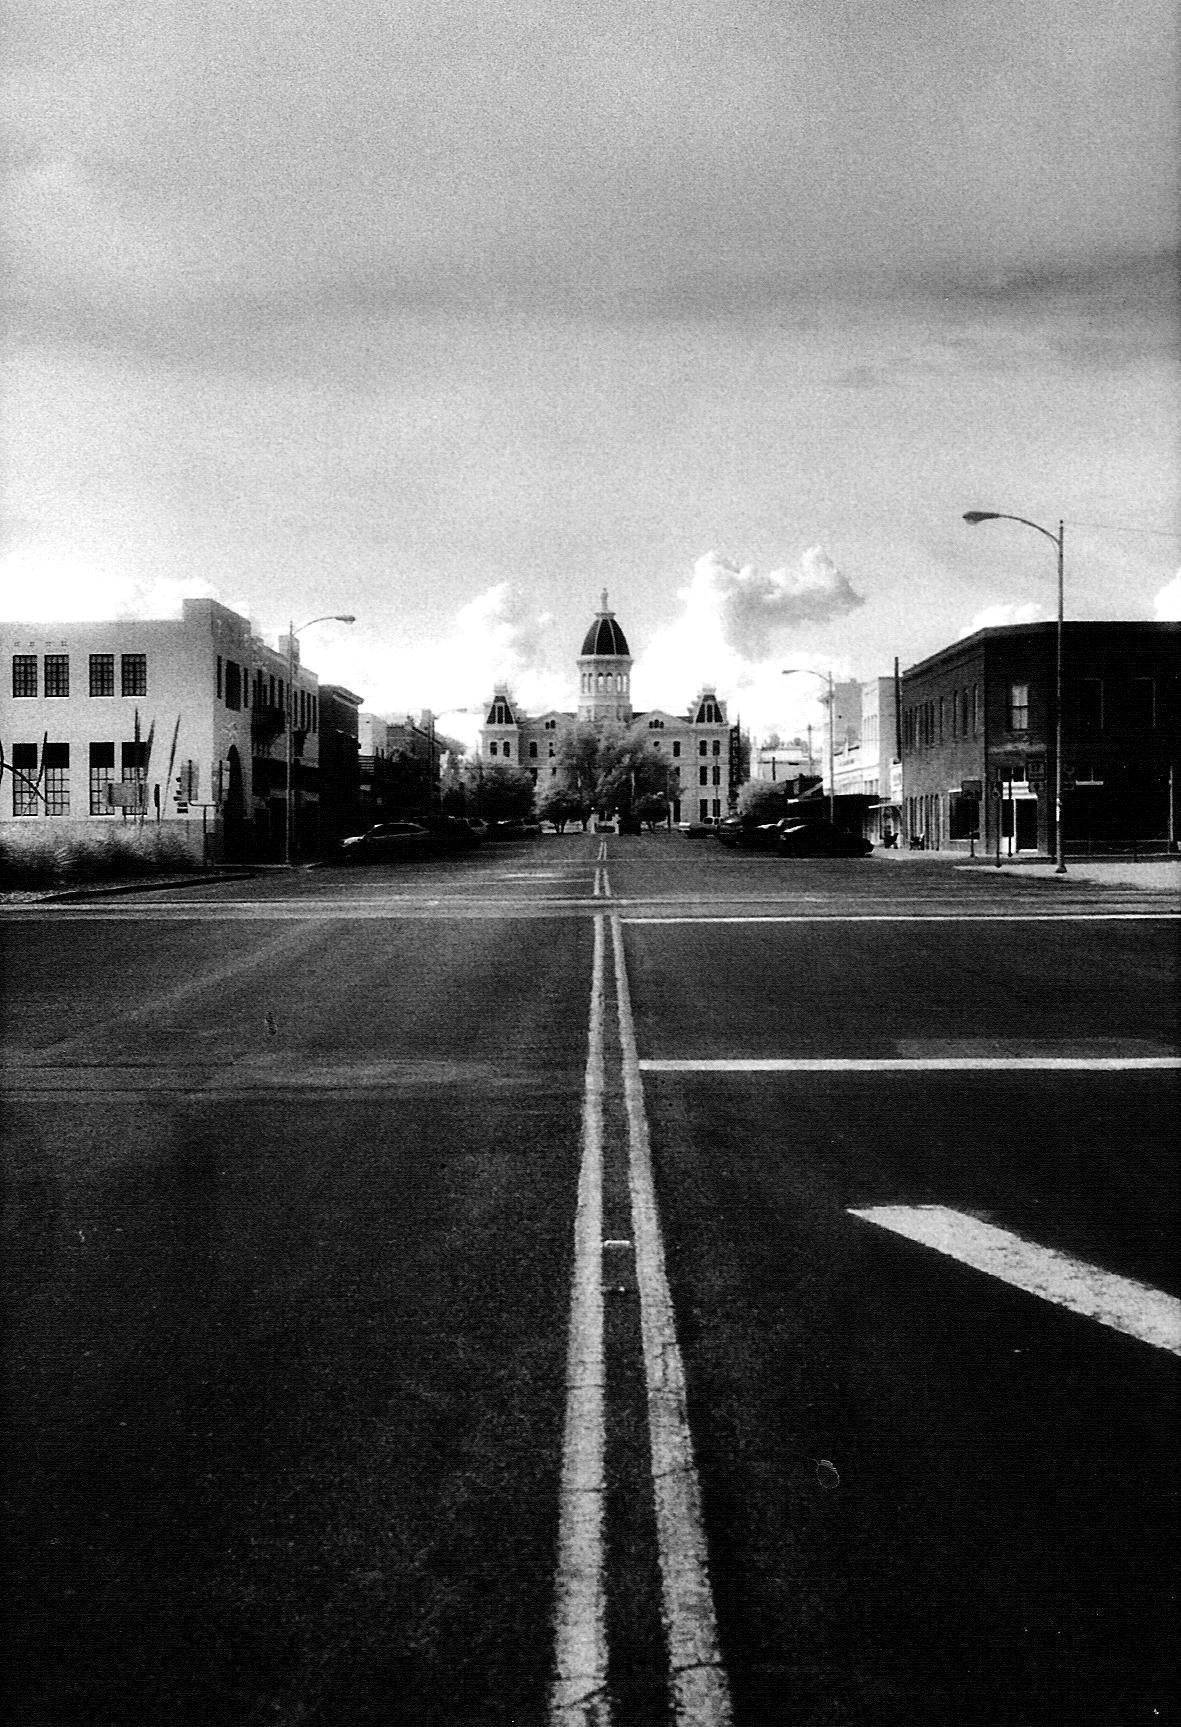 Highland Ave Marfa, TX